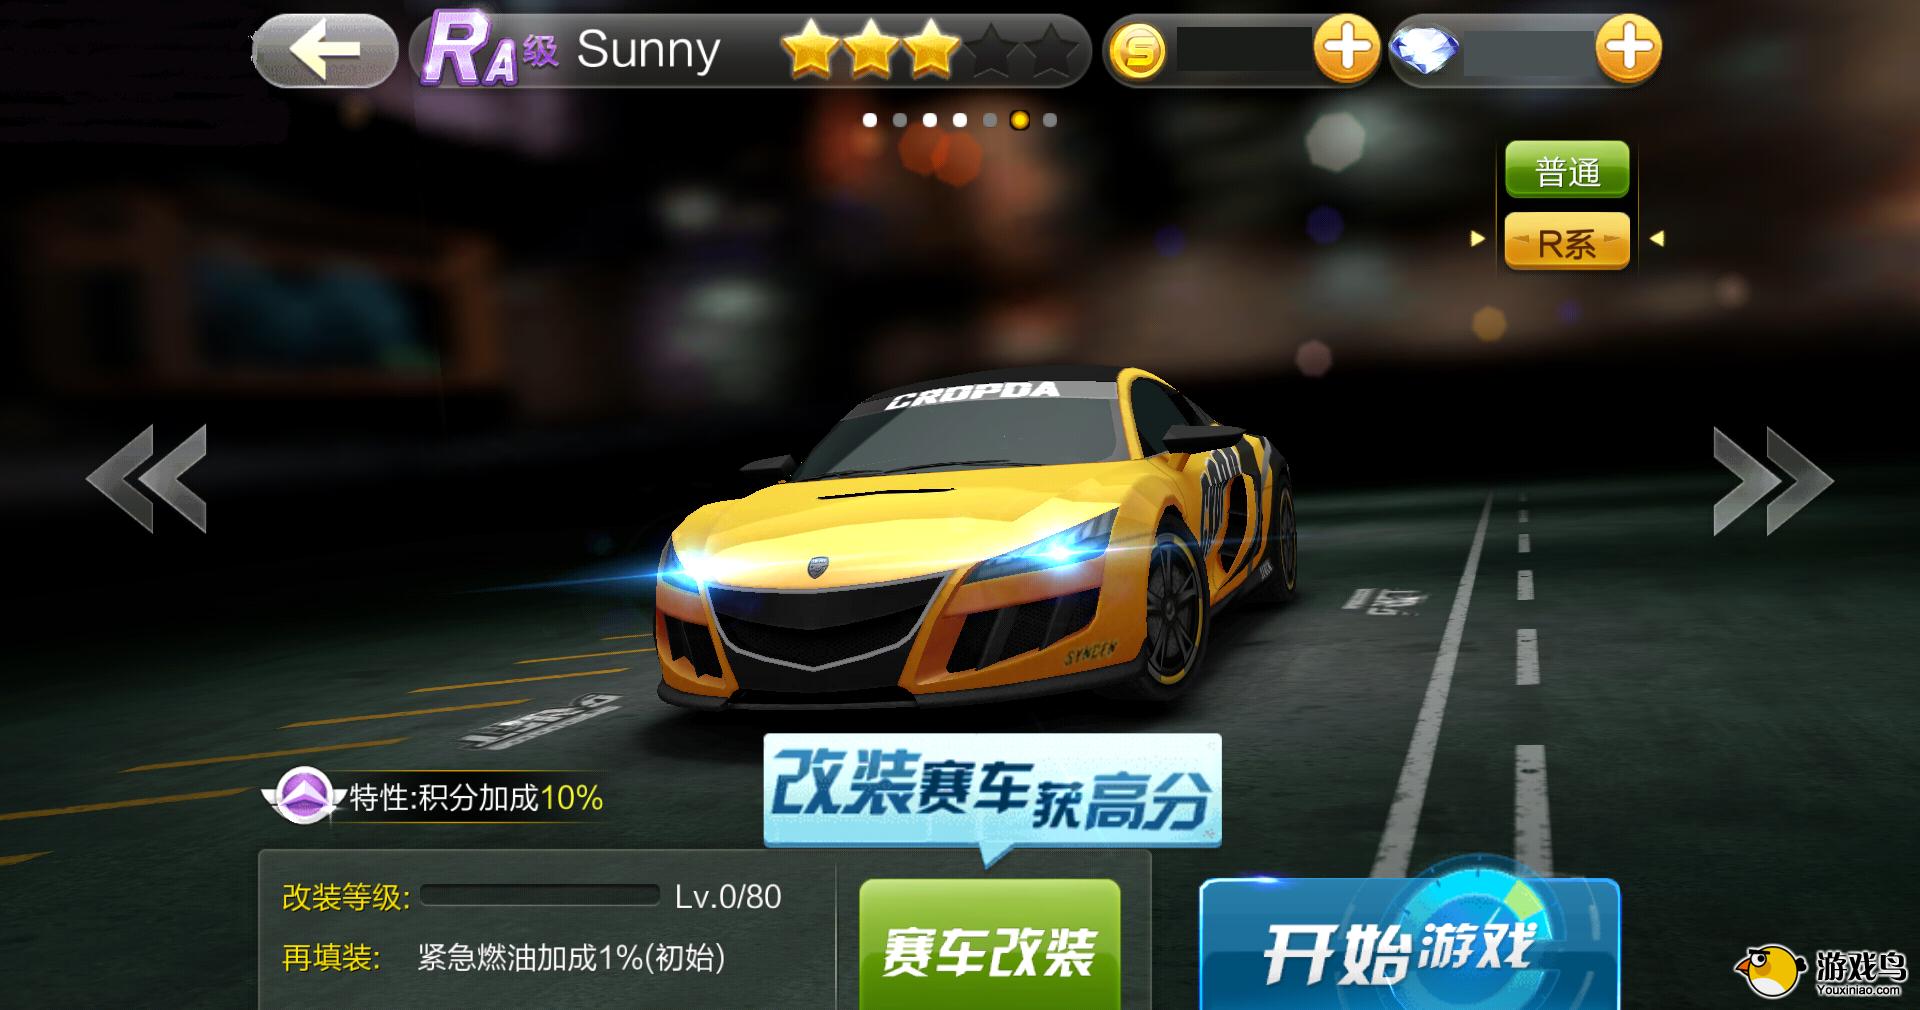 RA级Sunny 赛车性能介绍[图]图片1